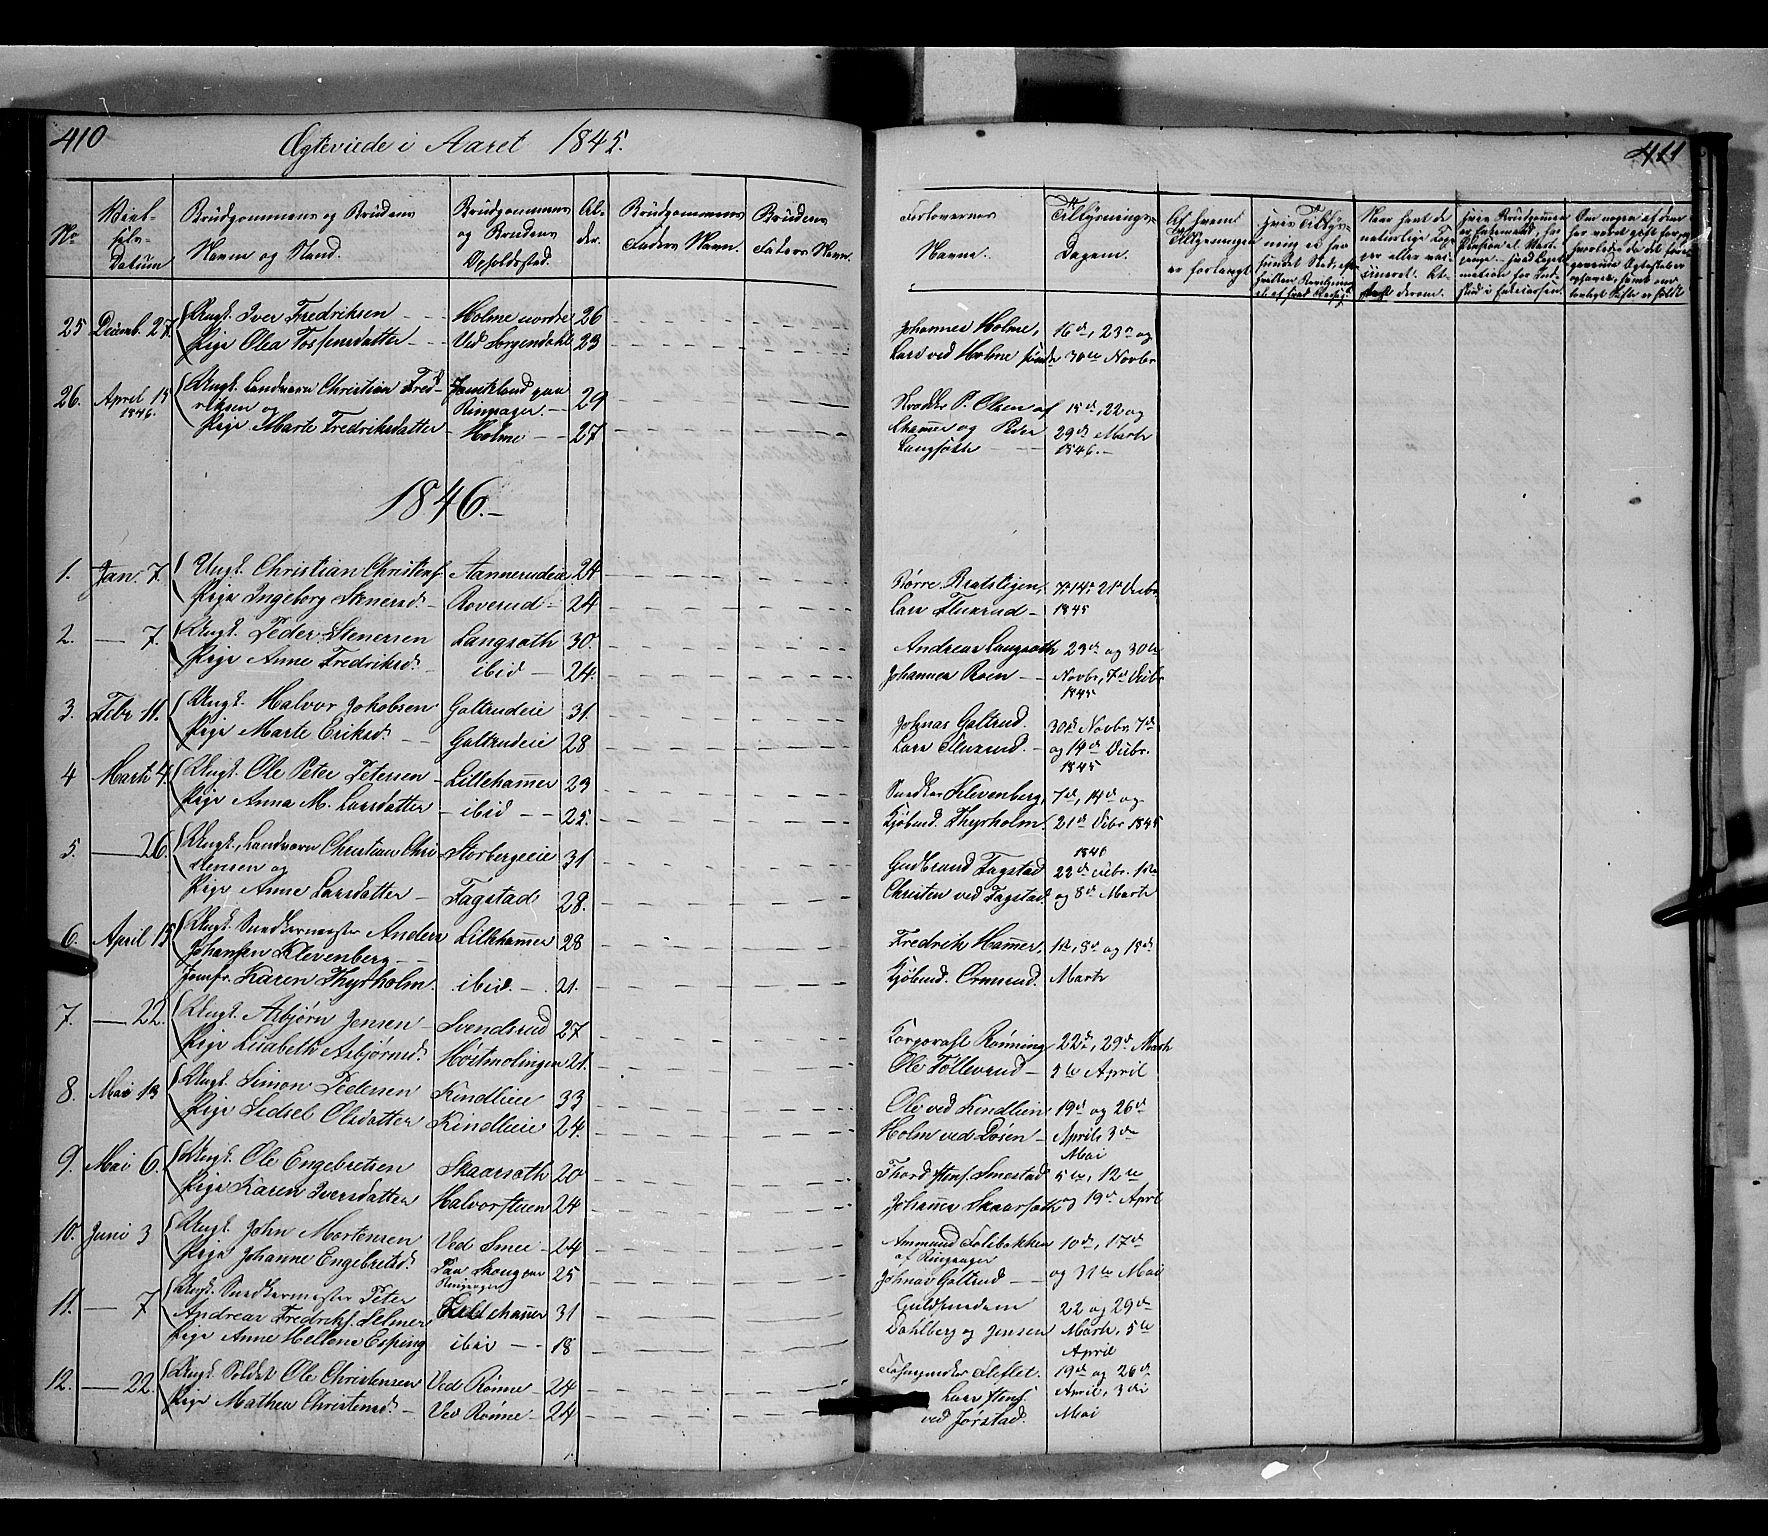 SAH, Fåberg prestekontor, Klokkerbok nr. 6, 1837-1855, s. 410-411